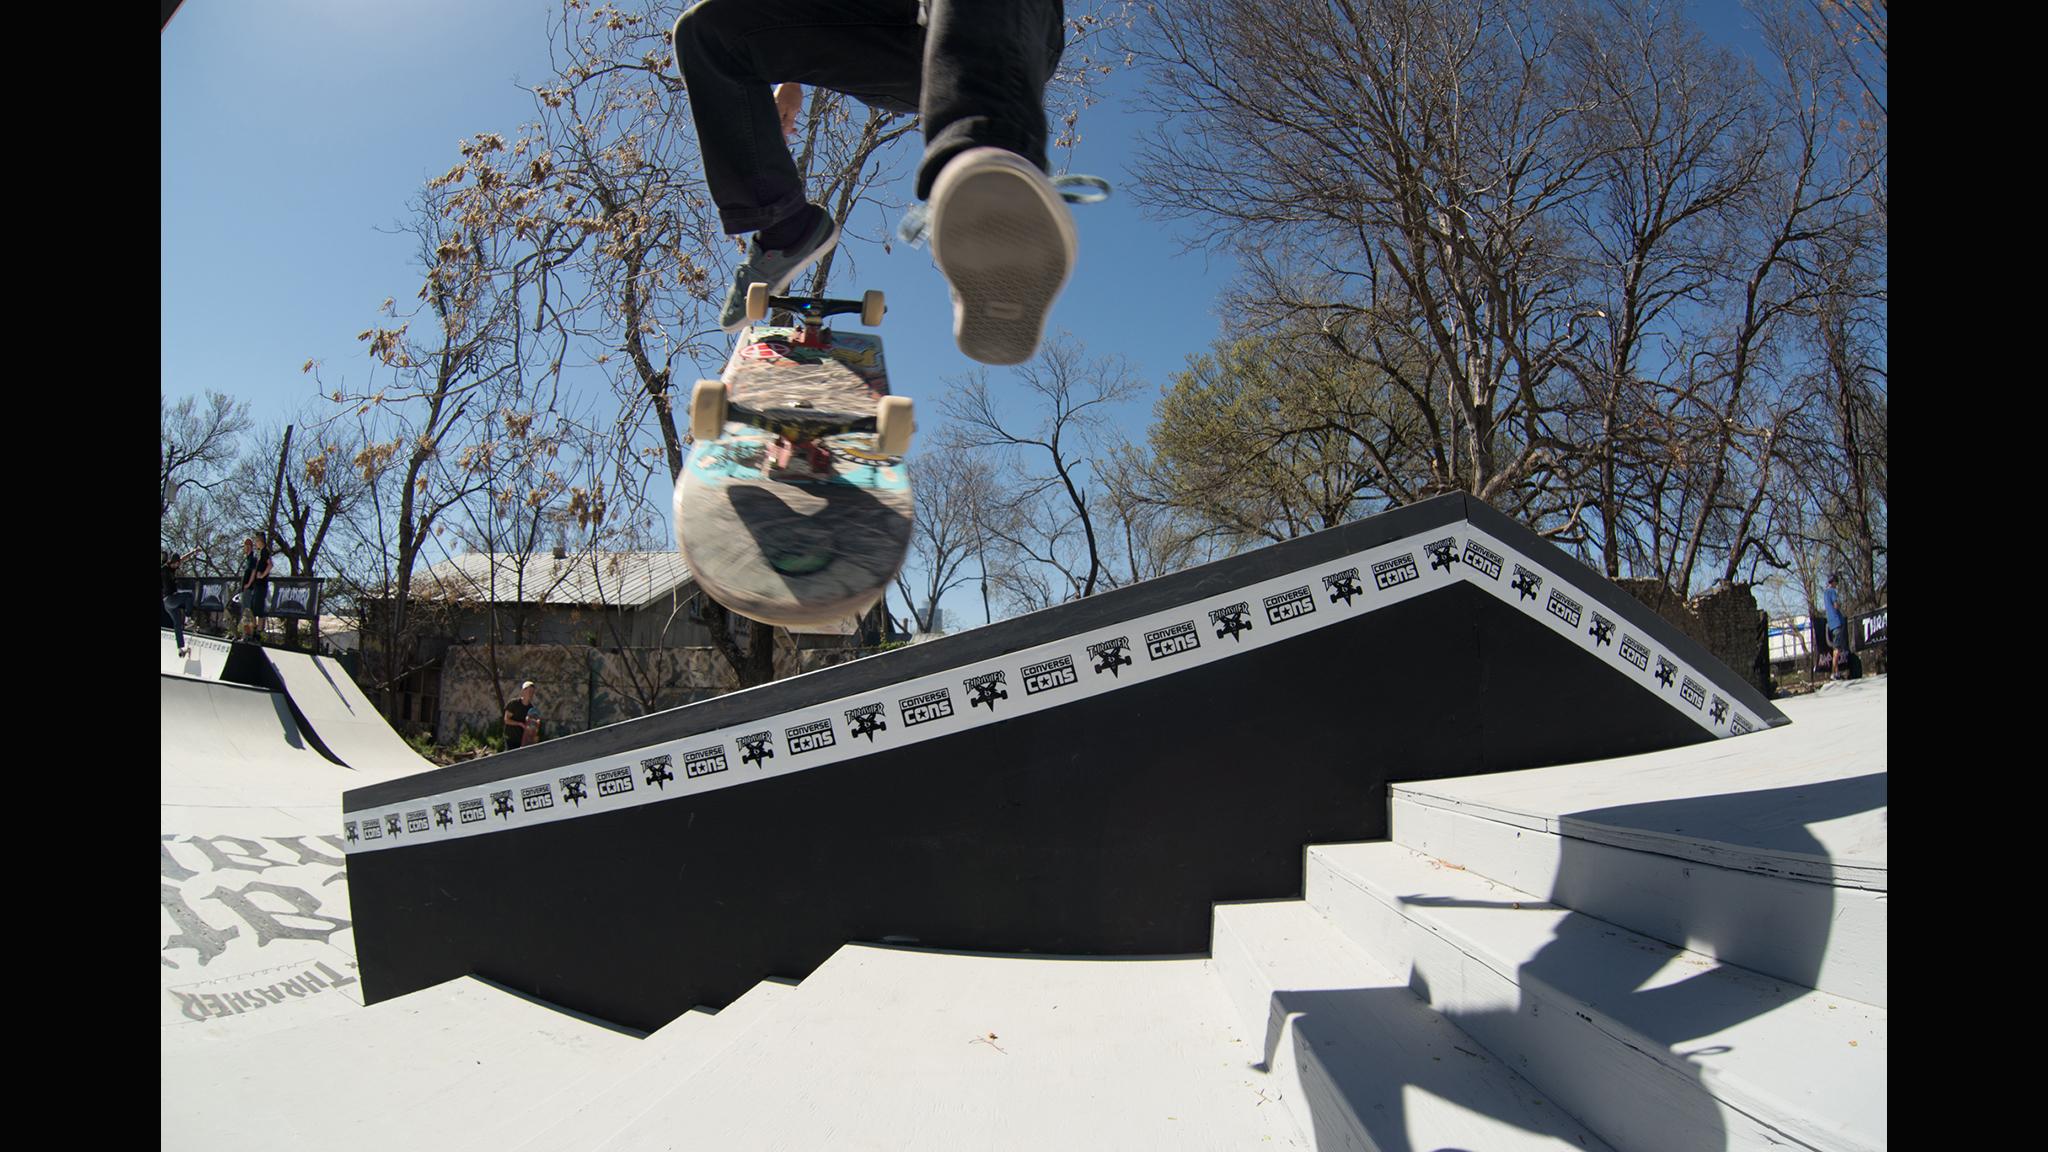 360 flip